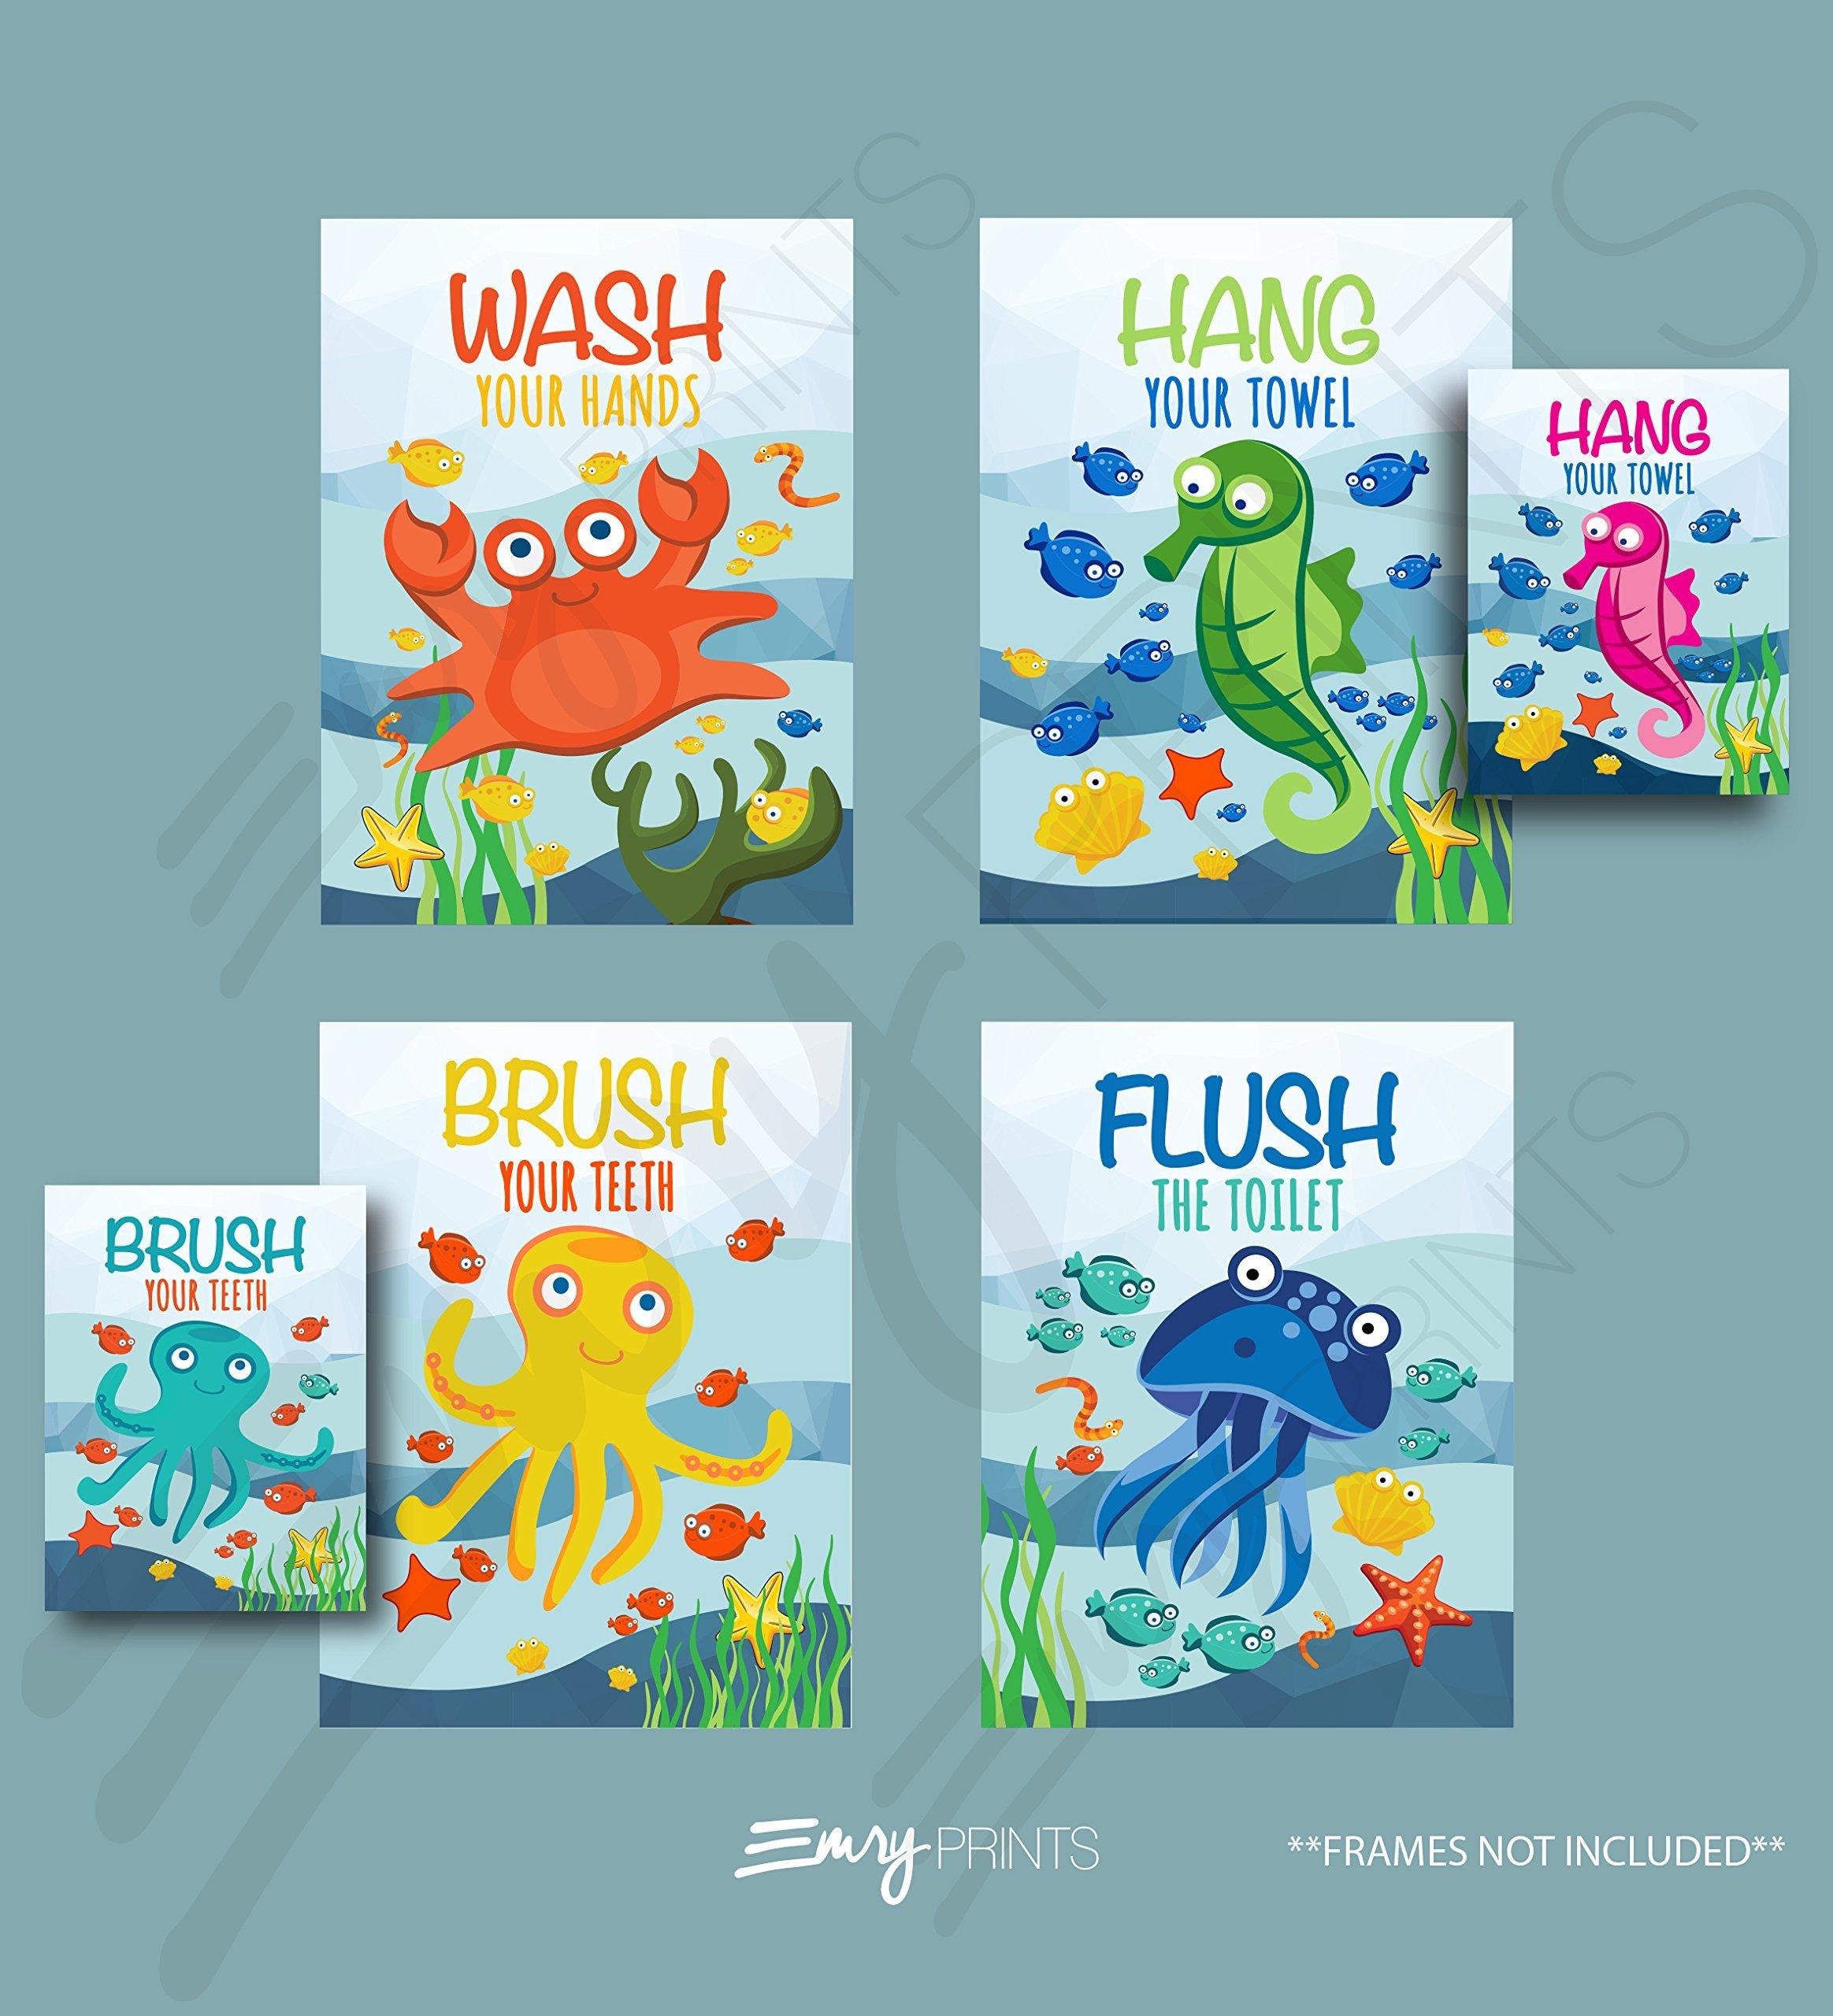 Ocean Bathroom Art Prints (Set of 4) (Unframed) 8x10 - Underwater Bathroom Wall Art Prints Children's Underwater Bathroom Ocean Theme Bathroom Wall Art 8x10 (Brush Flush Hang & Wash)